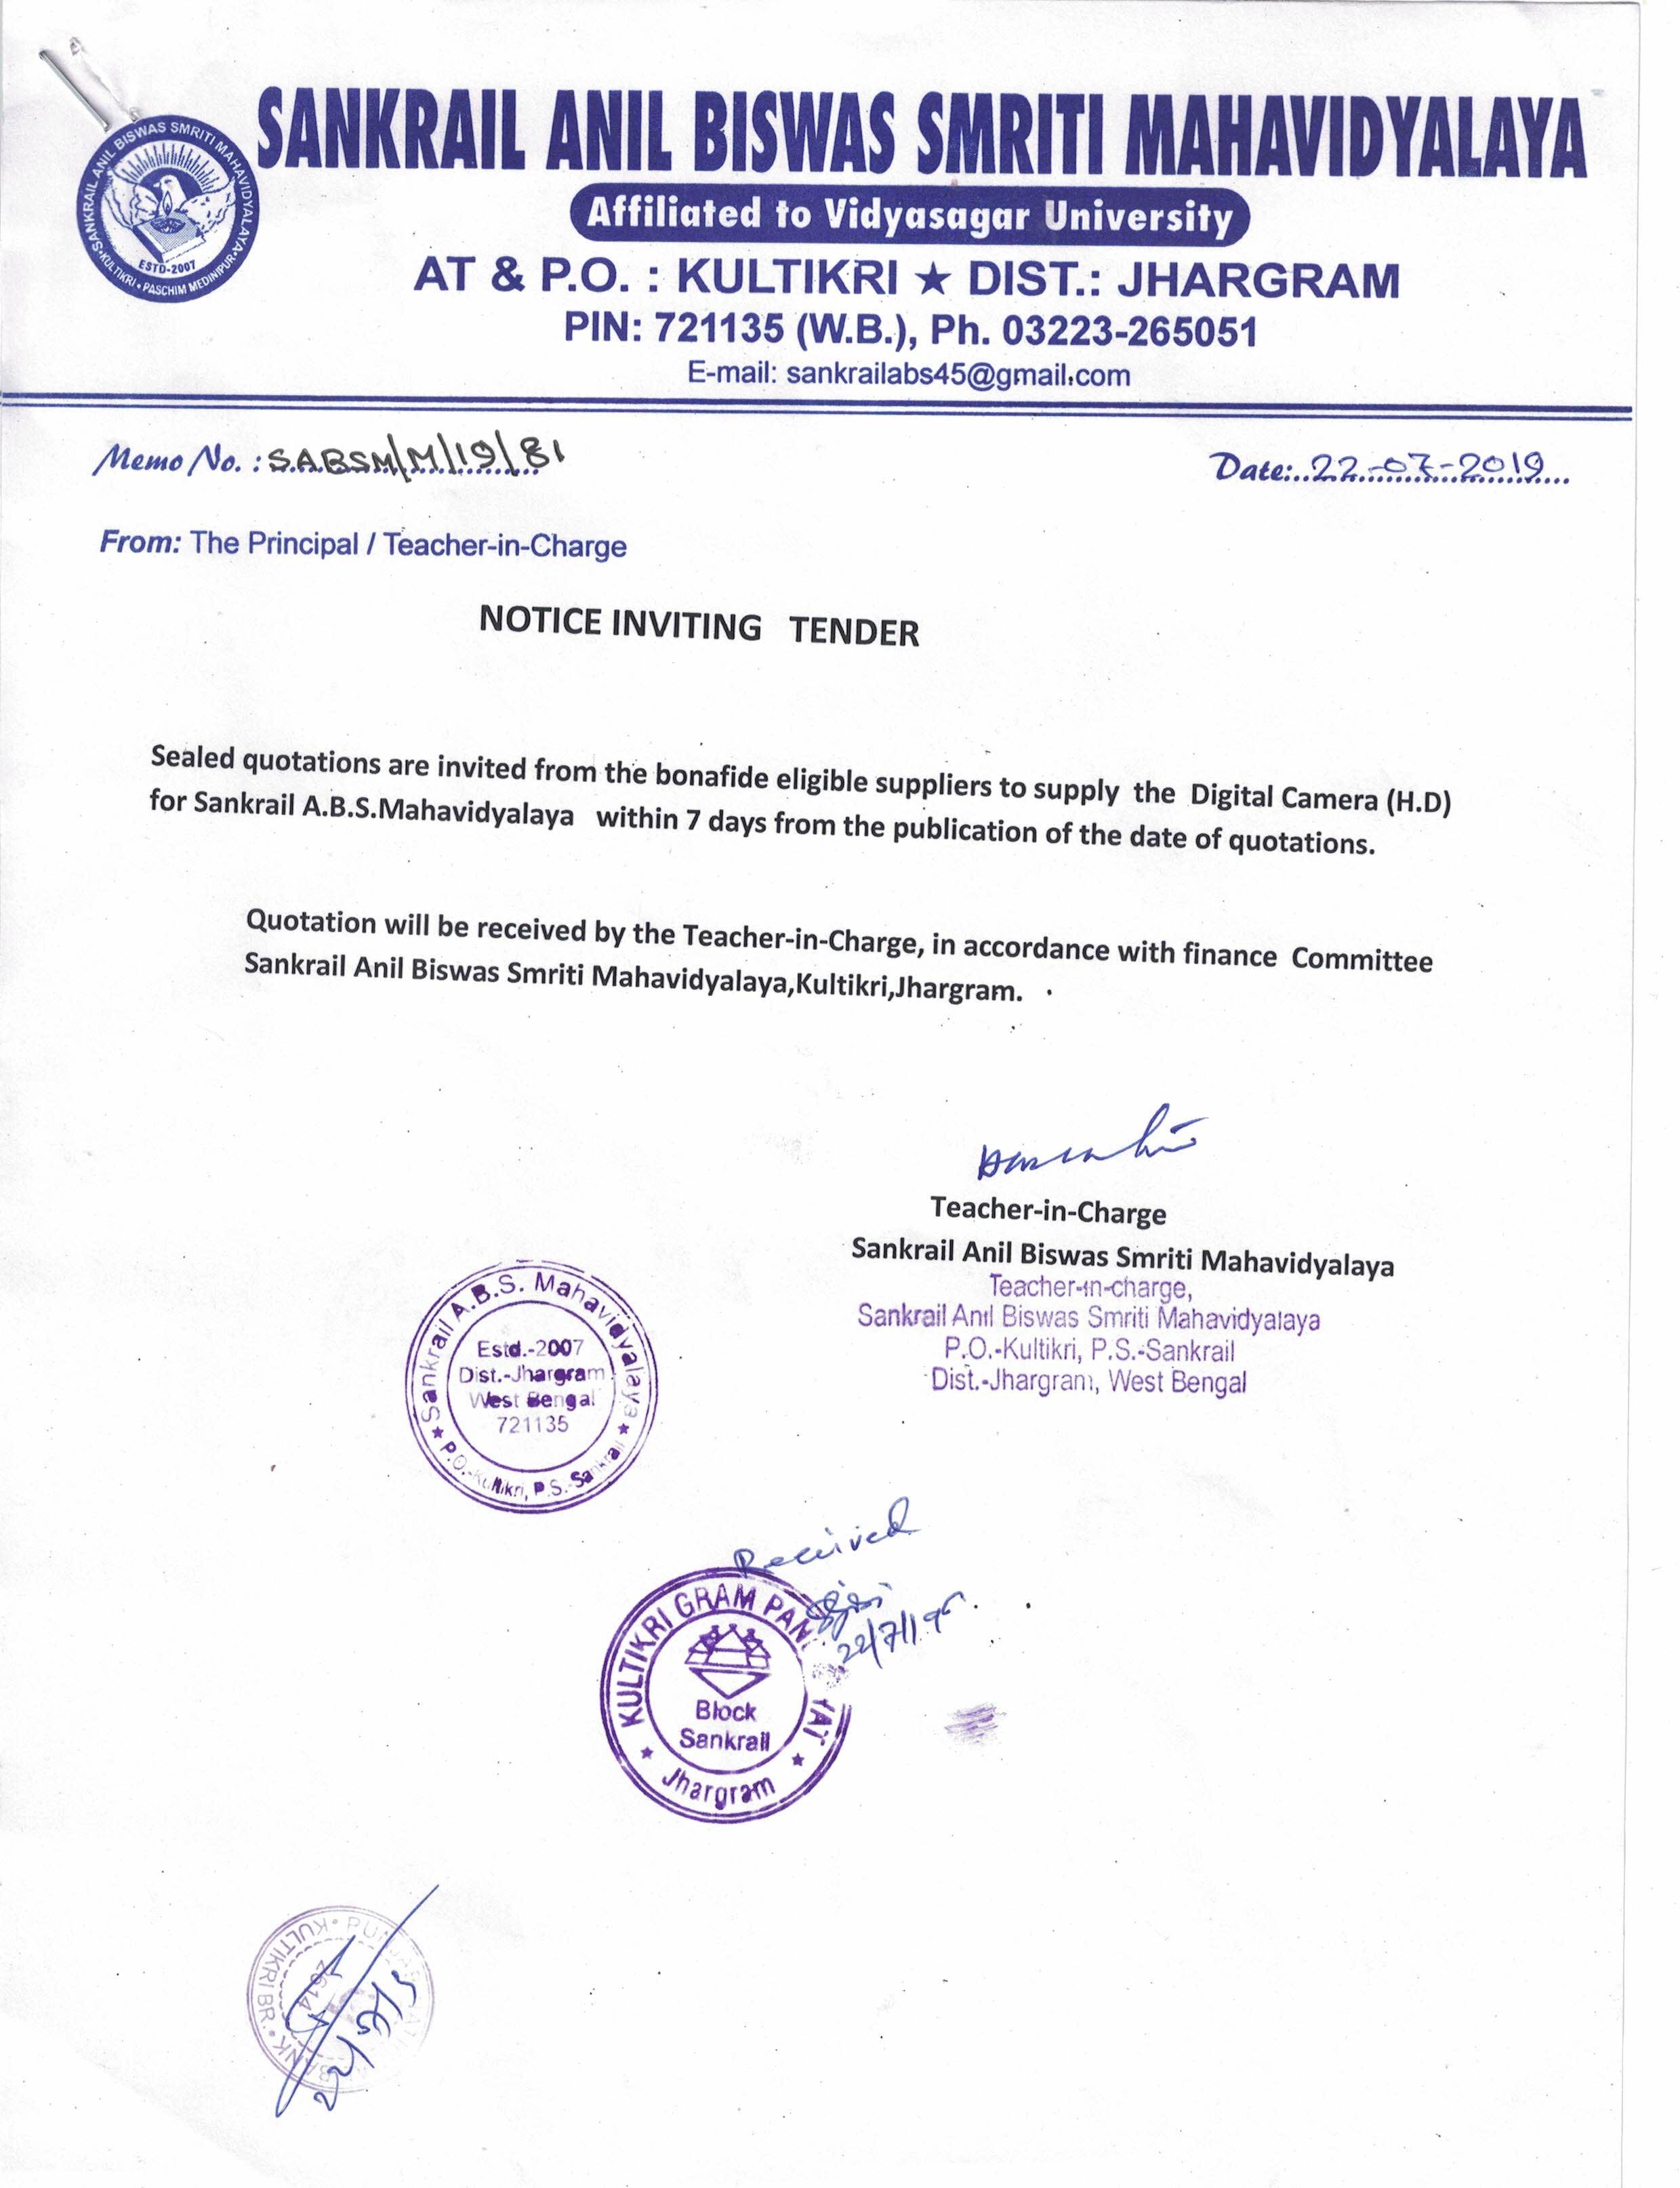 Sankrail Anil Biswas Smriti Mahavidyalaya